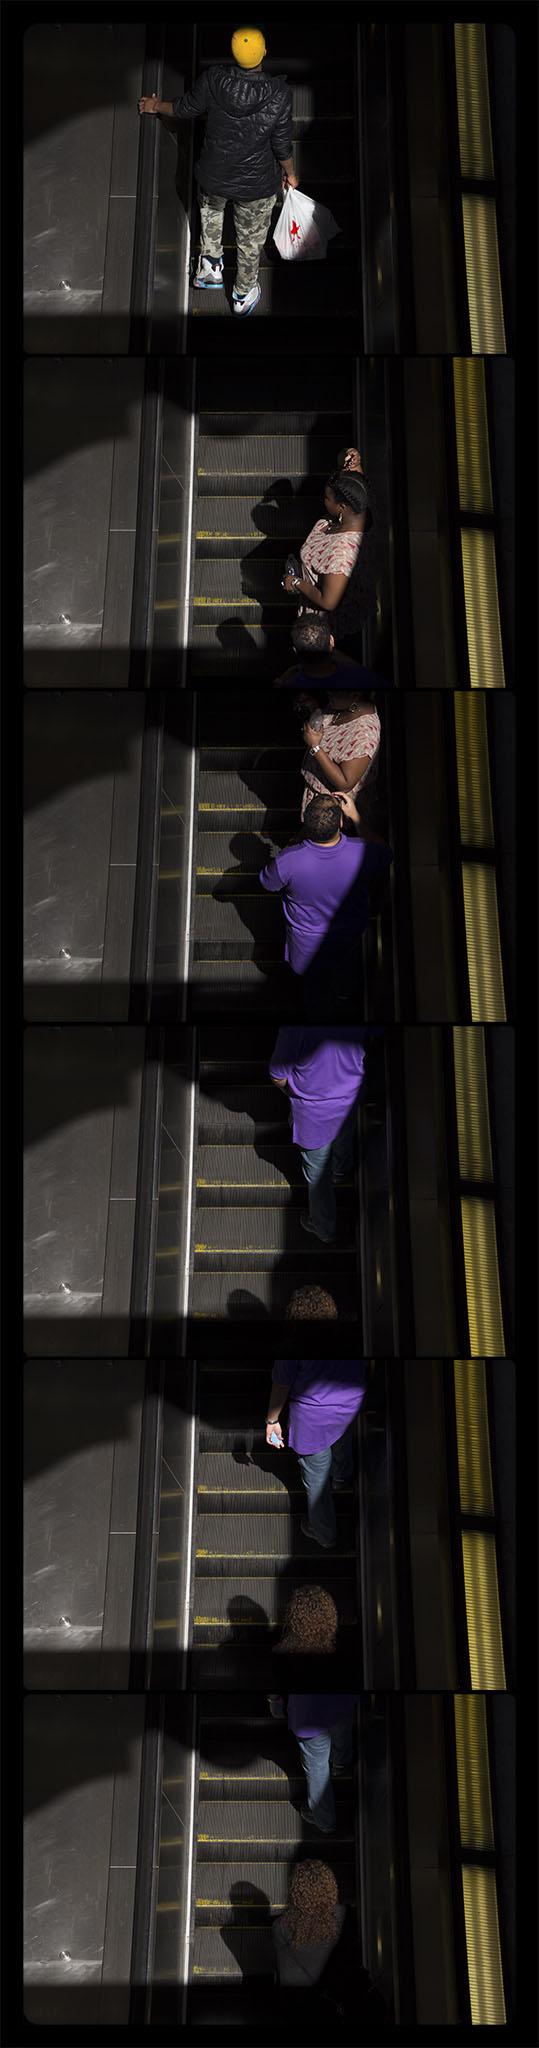 Metro Rail, Gallery Place-Chinatown, 4-21-2012-5896-5901